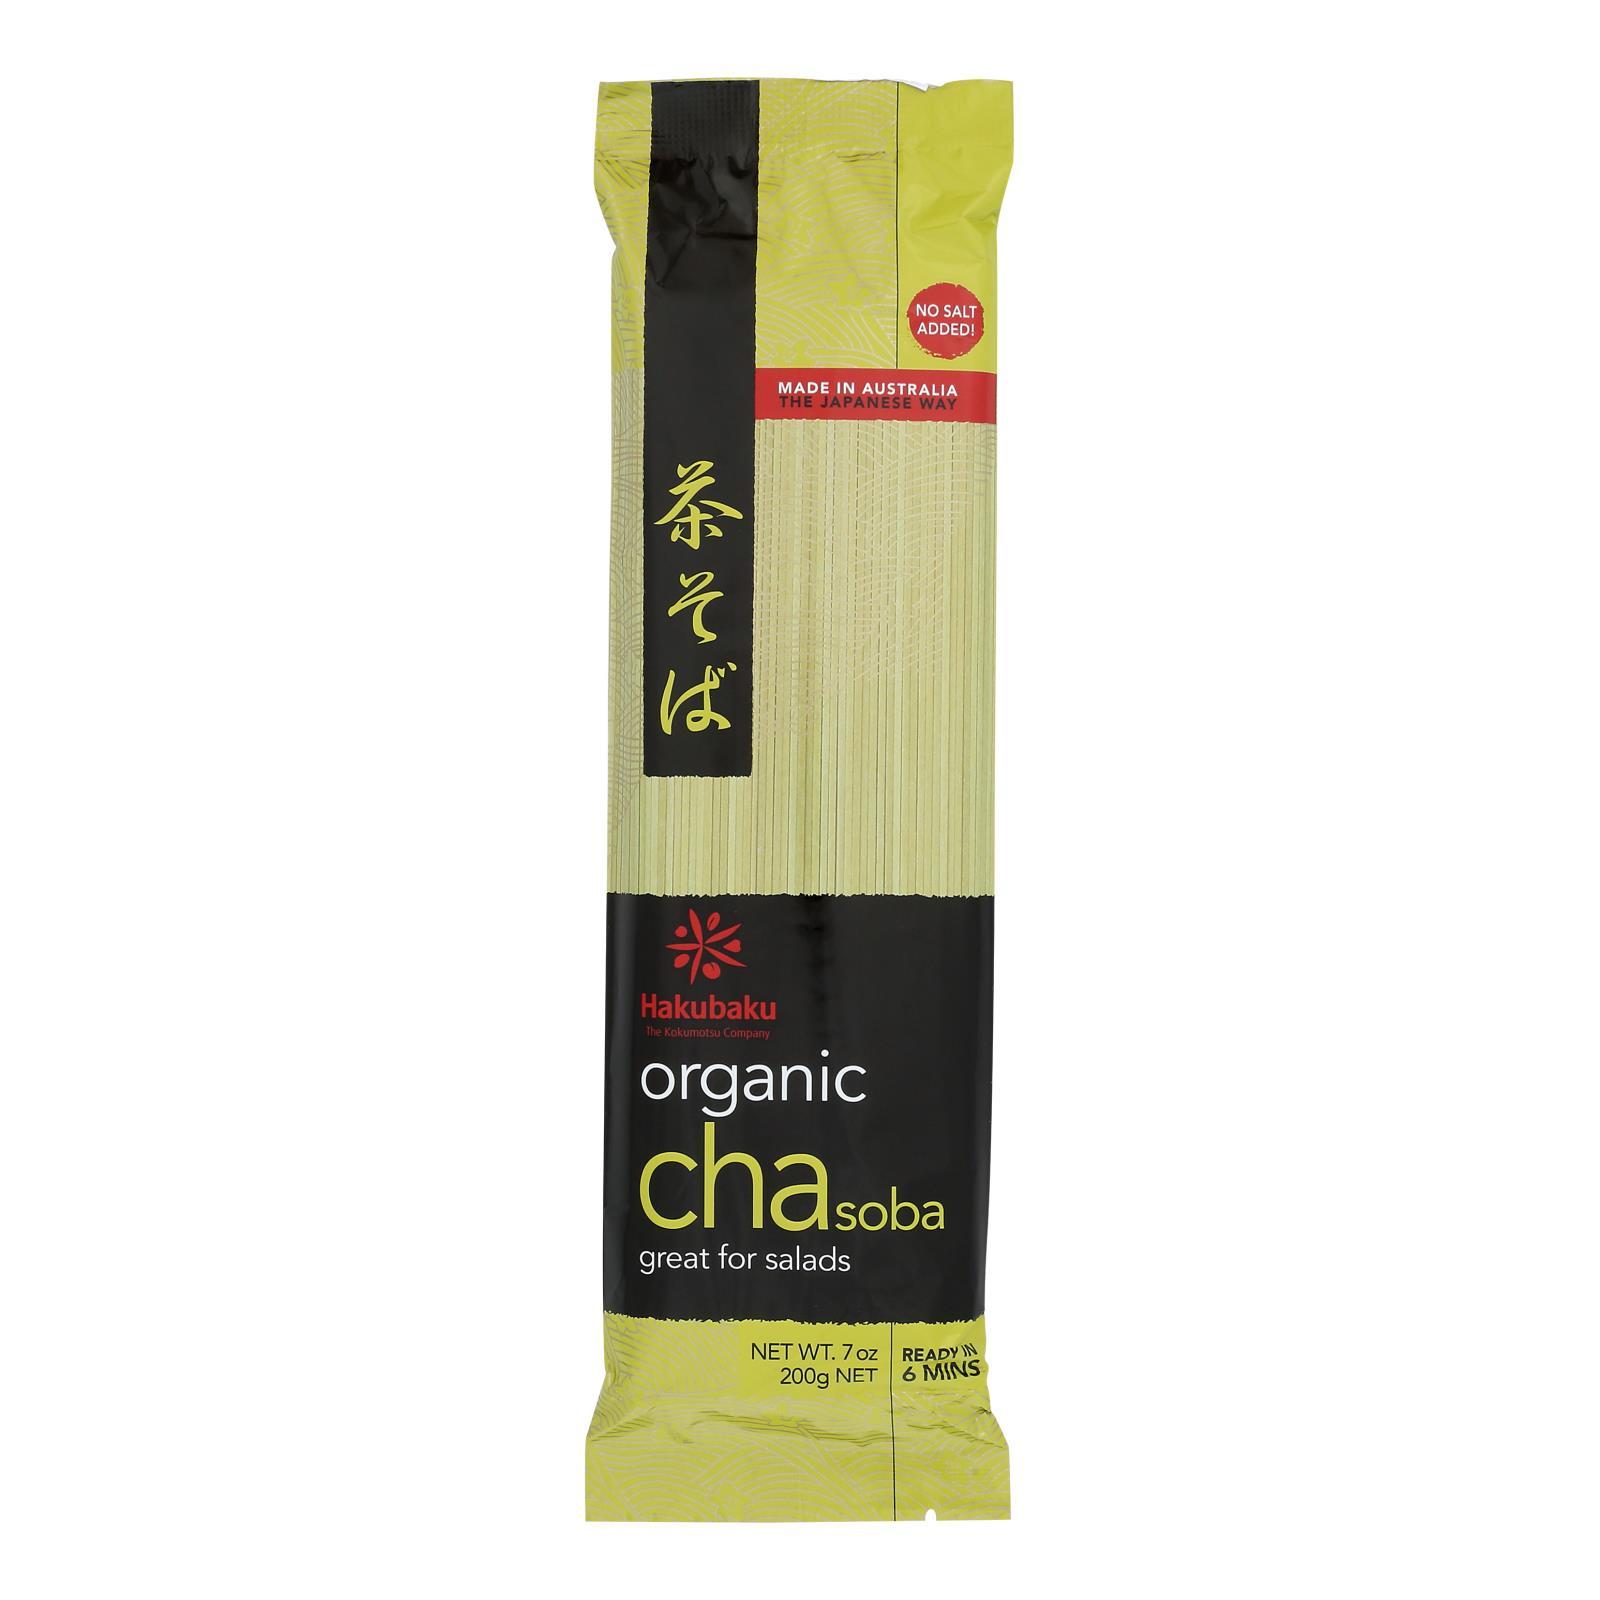 Hakubaku 100% Organic Noodles - Soba Green Tea - Case of 10 - 7.05 oz